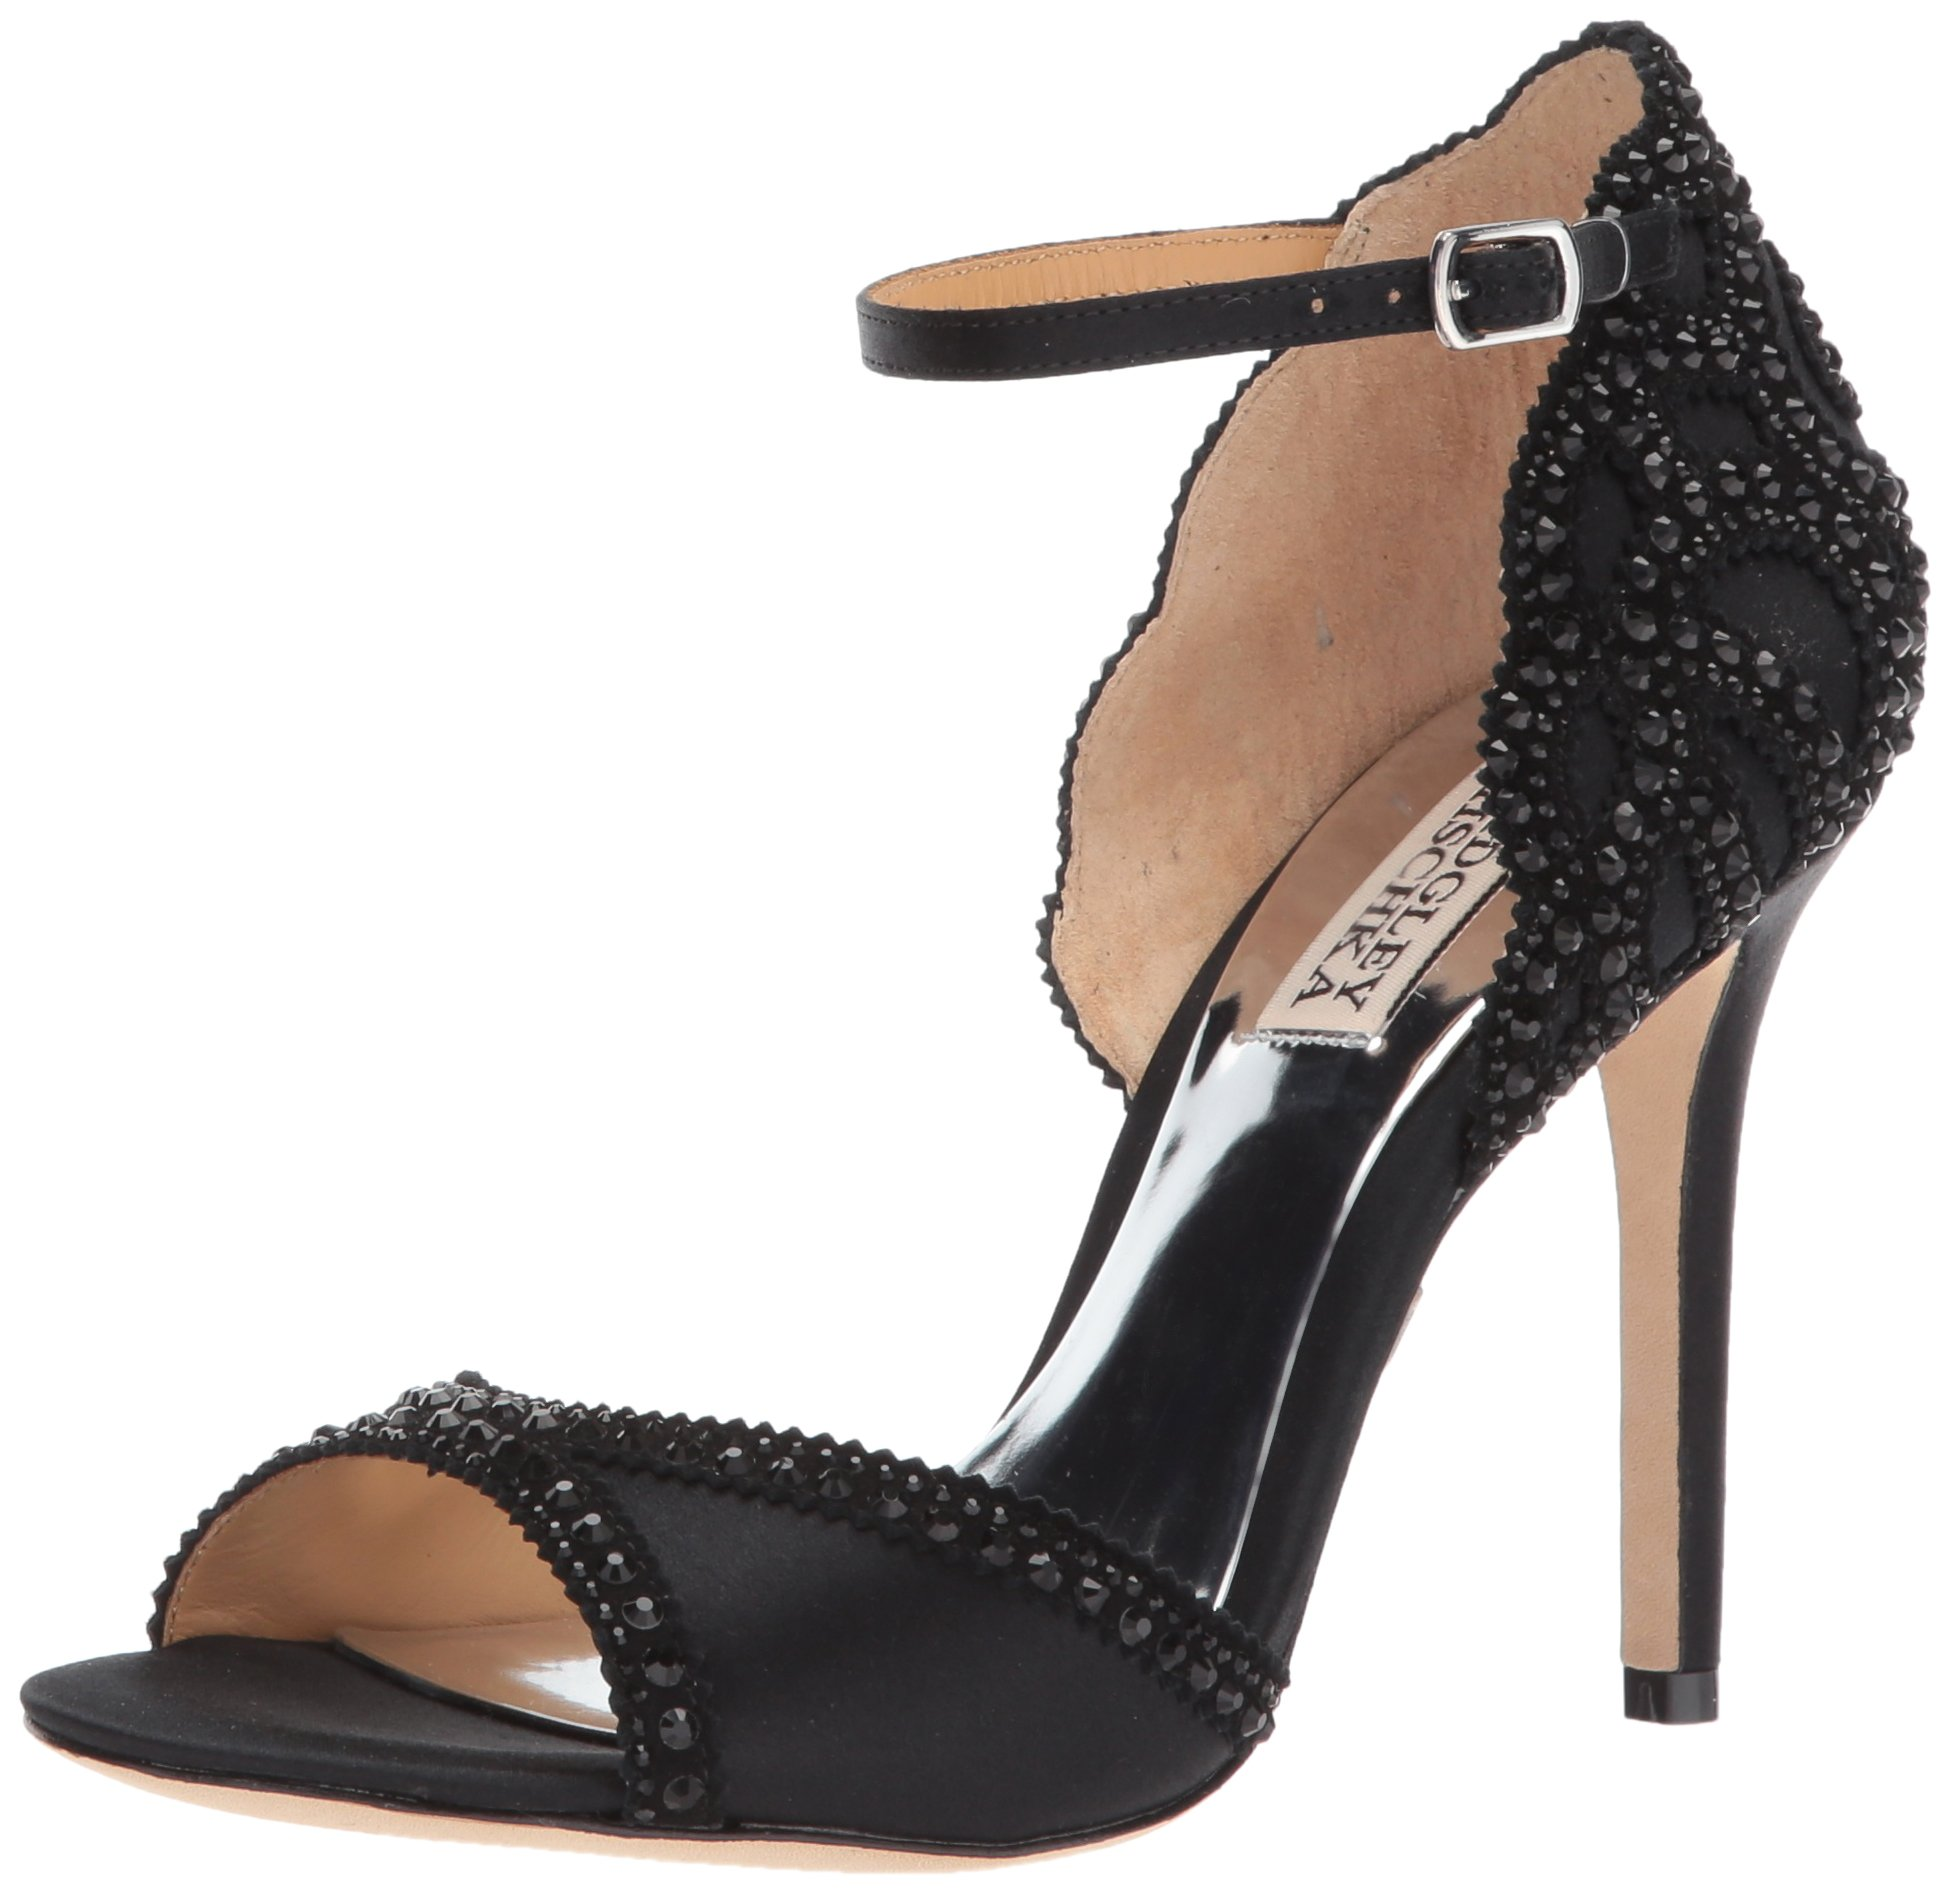 Badgley Mischka Women's Roxy Heeled Sandal, Black, 6.5 M US